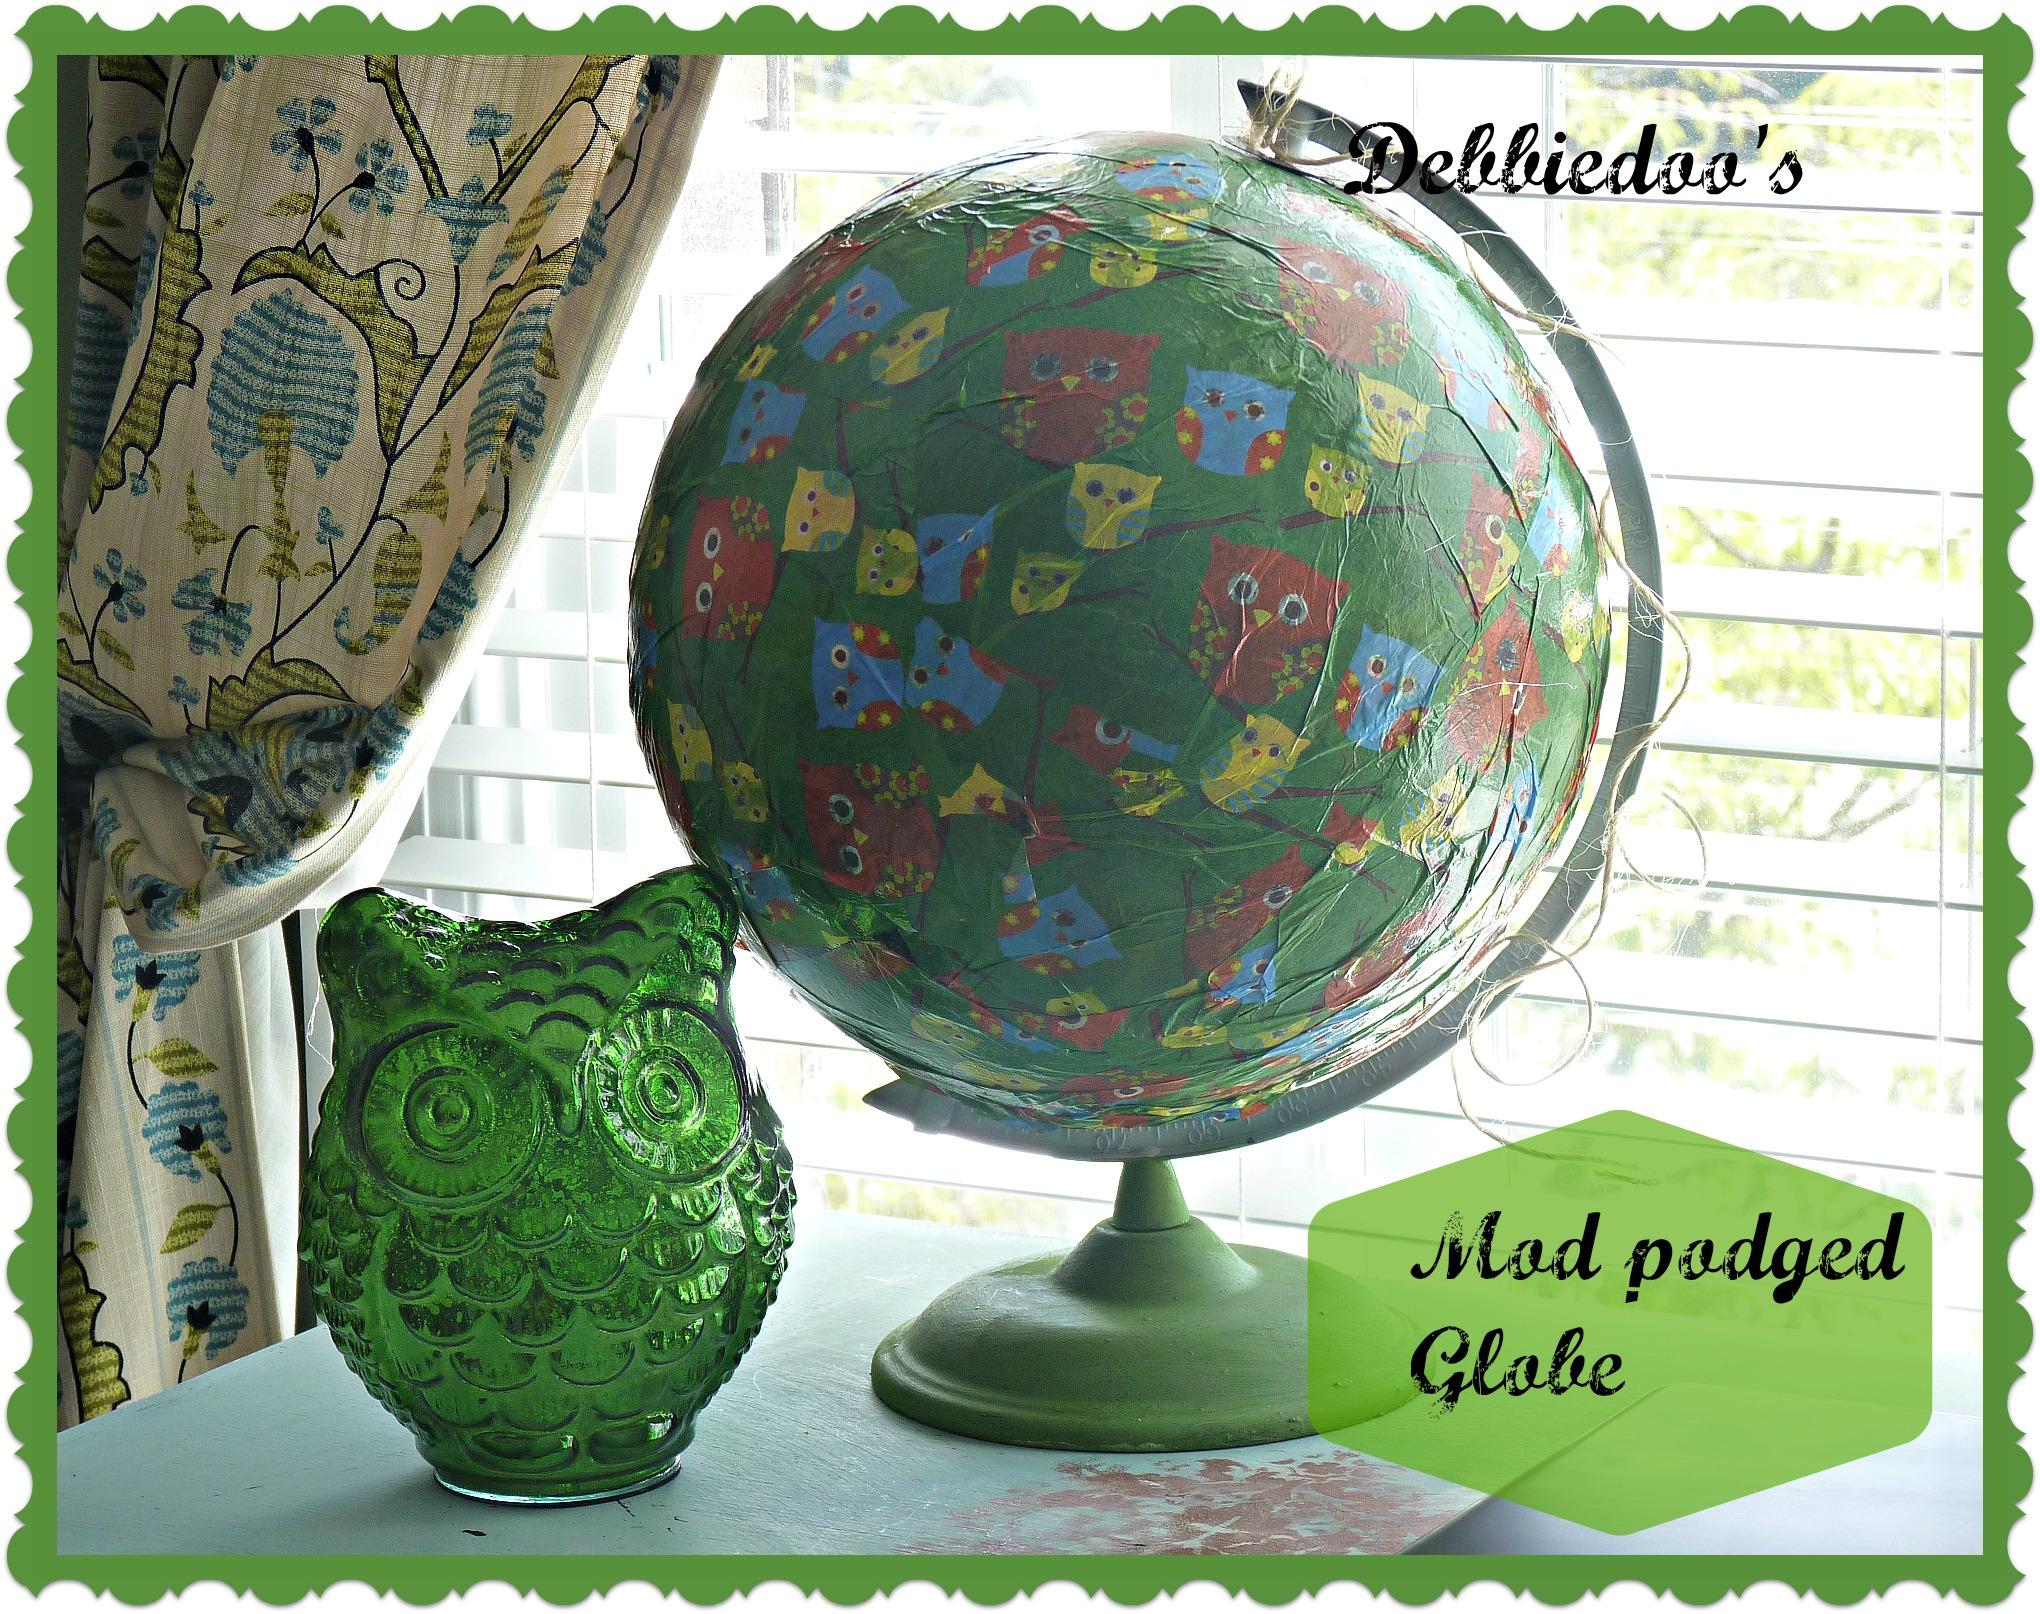 Mod podge on a globe